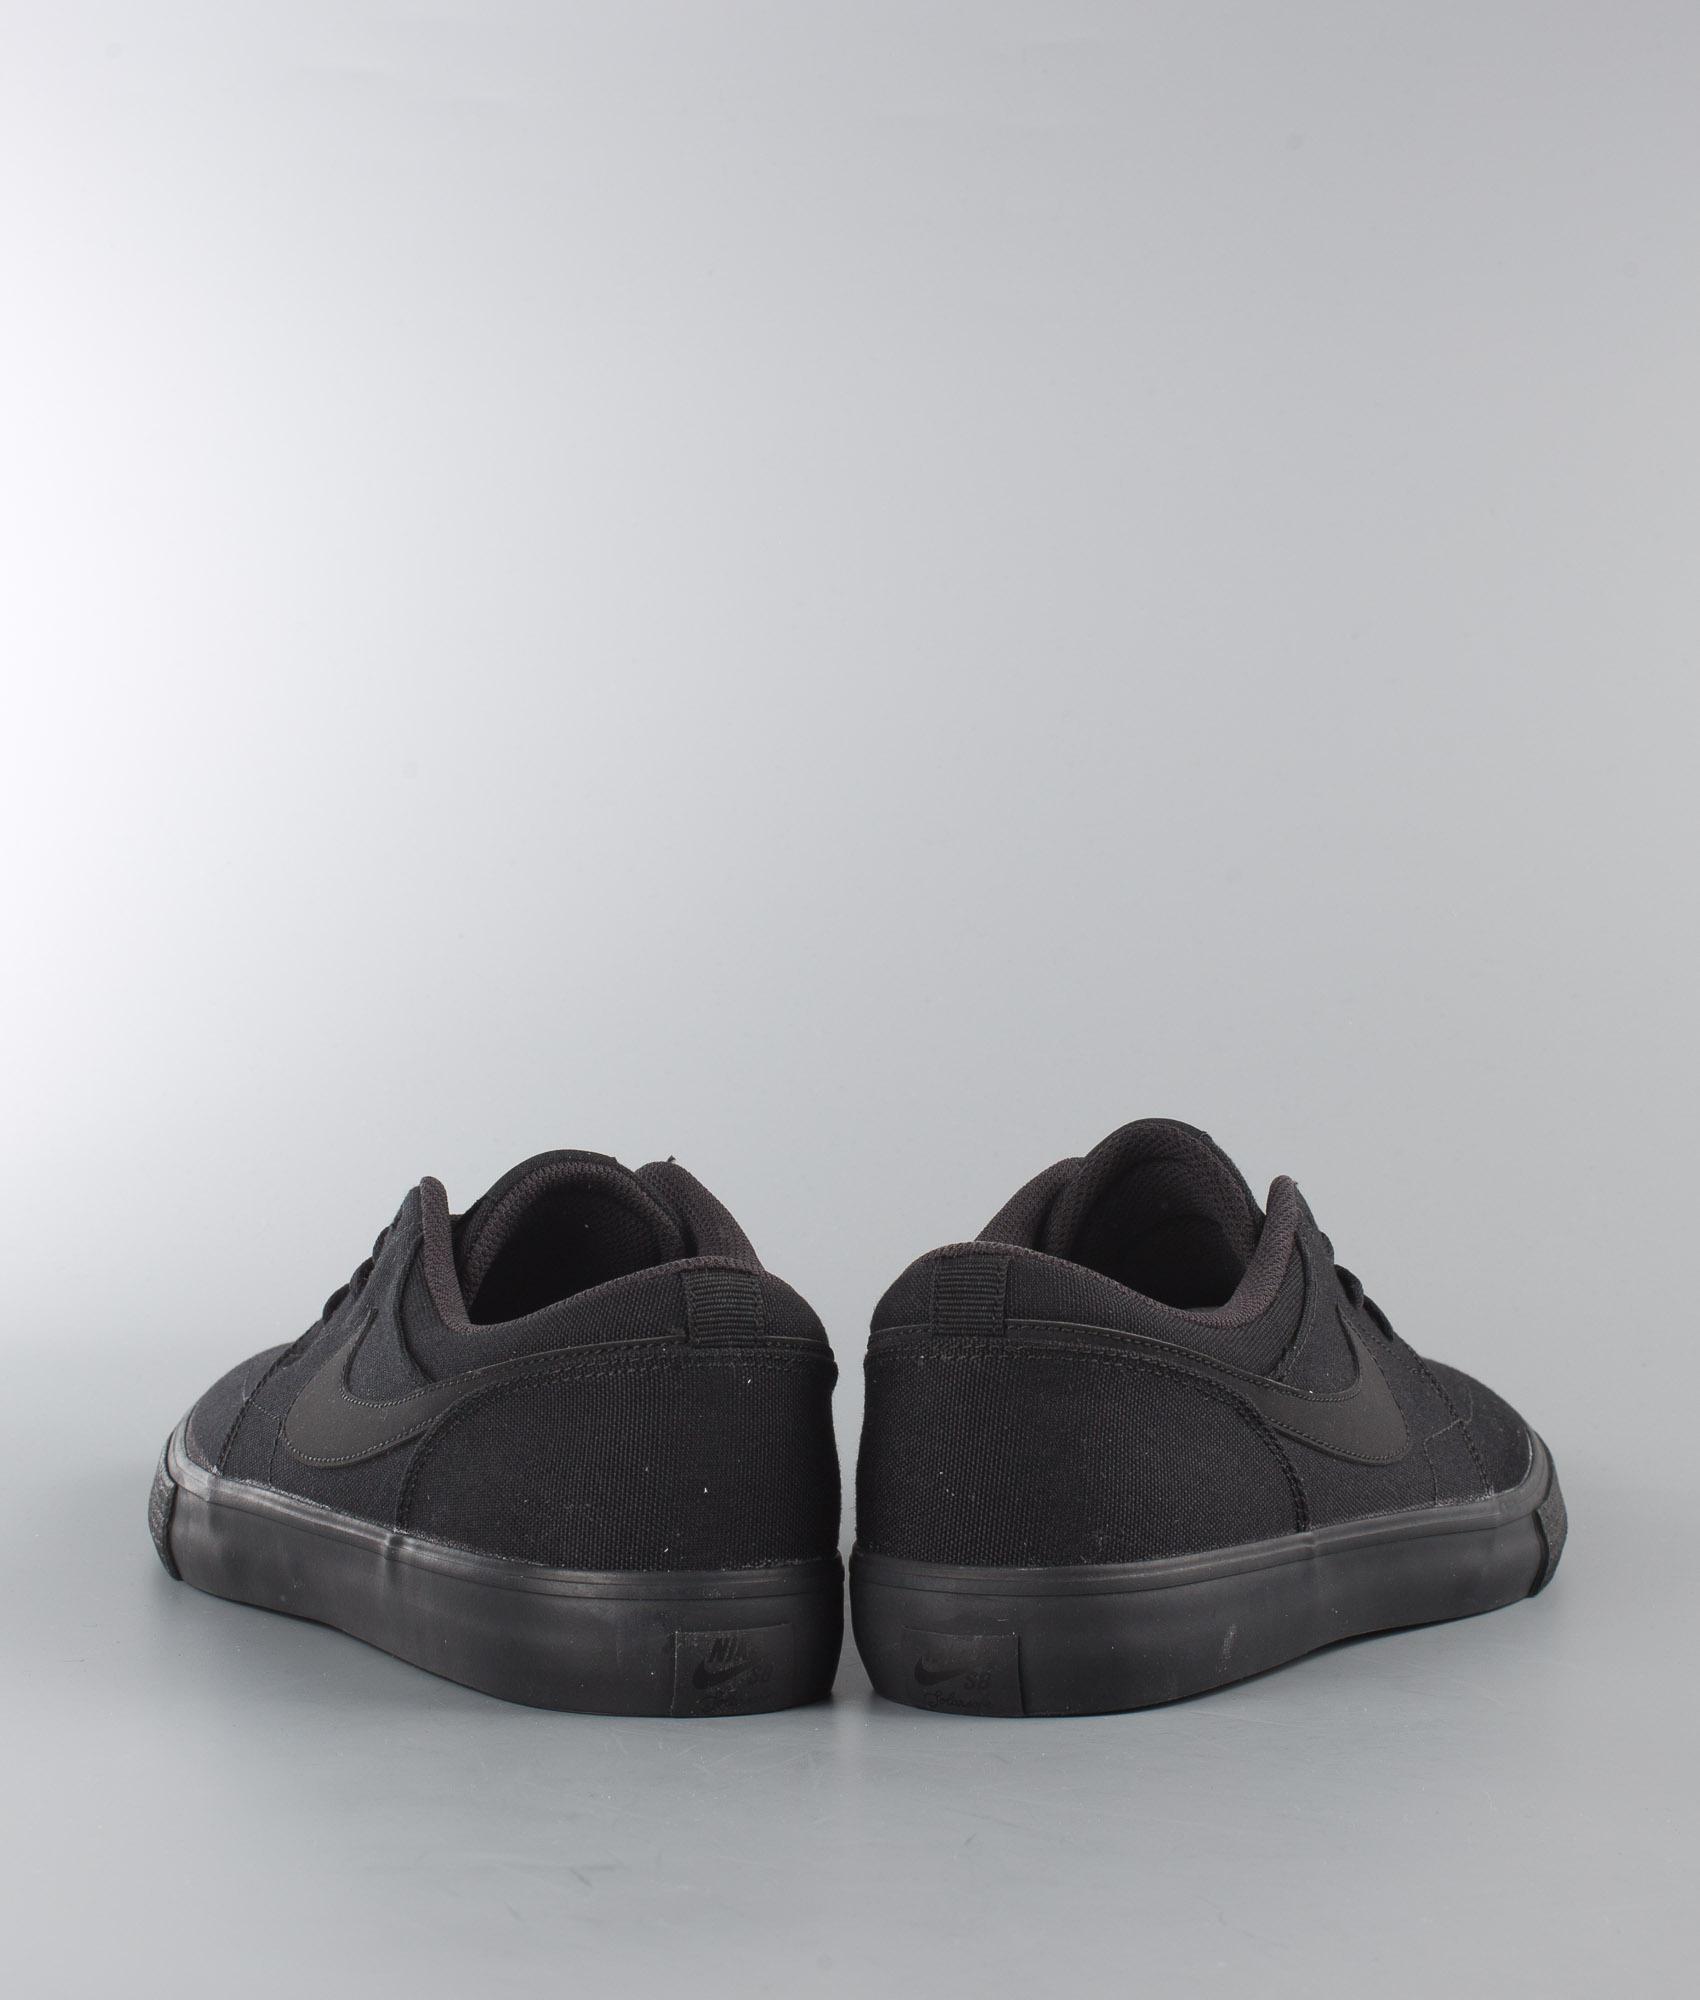 Zapatilla Nike Sb Portmore Ii Solar Cnvs Black 010